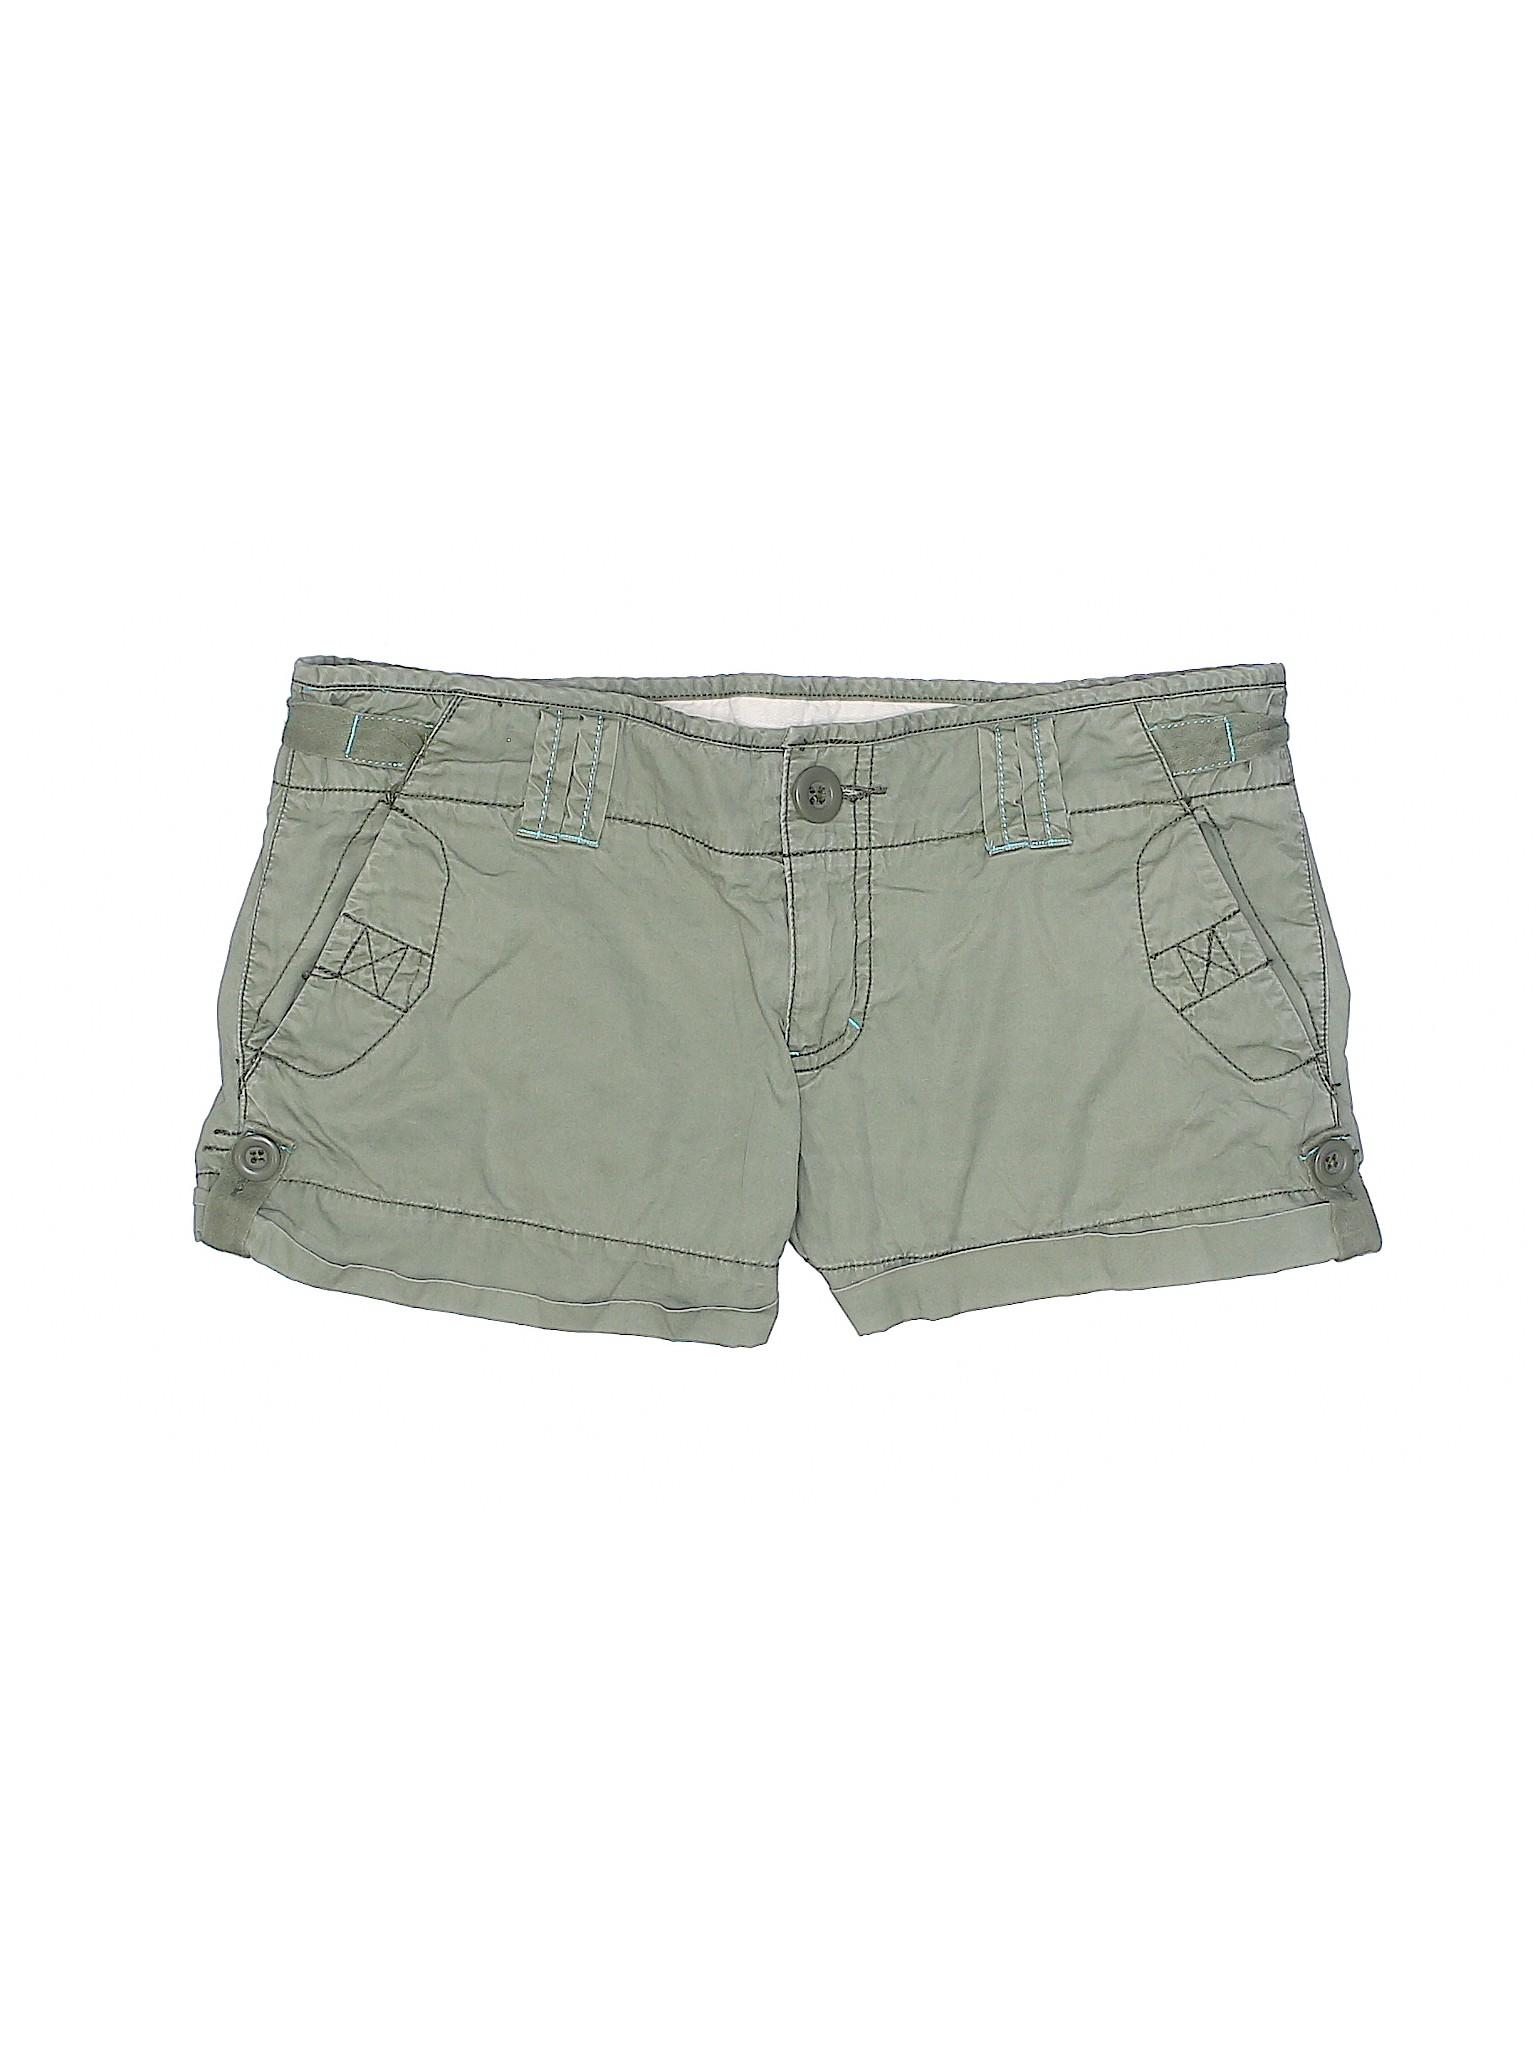 Shorts Khaki Outfitters Boutique Eagle American PwqZZaIS